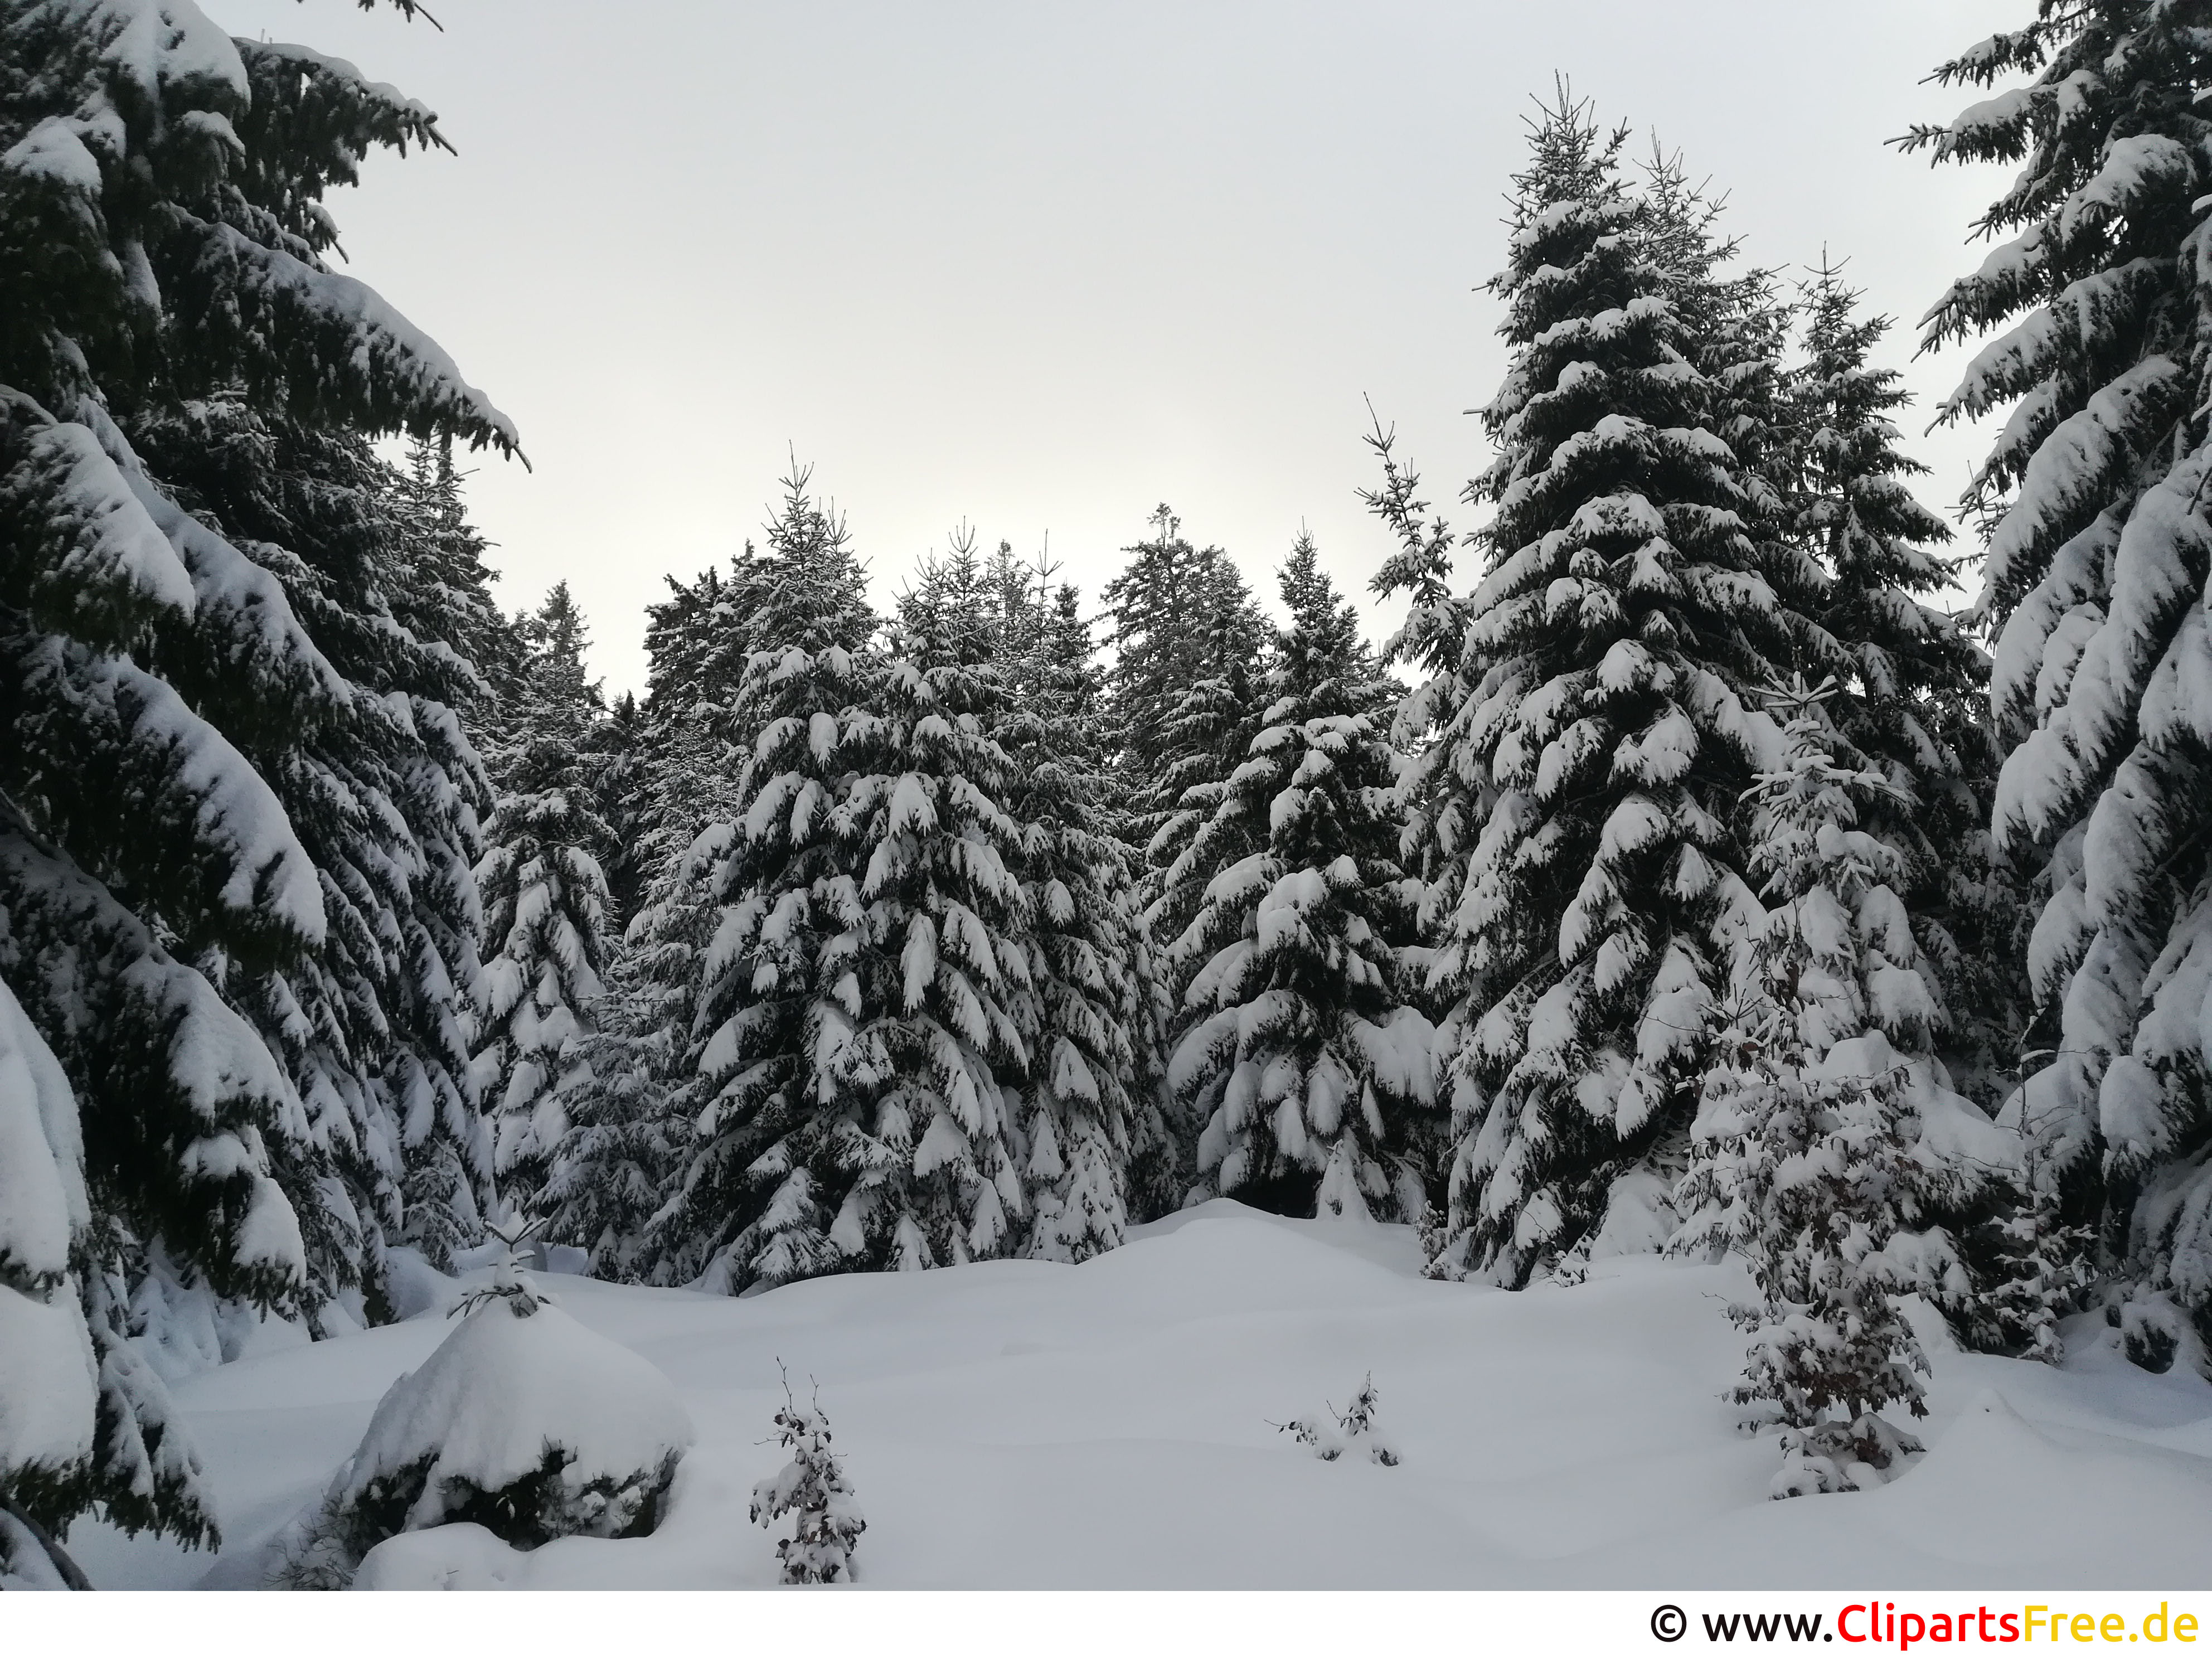 Winter im Harz Bild, Foto, Grafik kostenlos